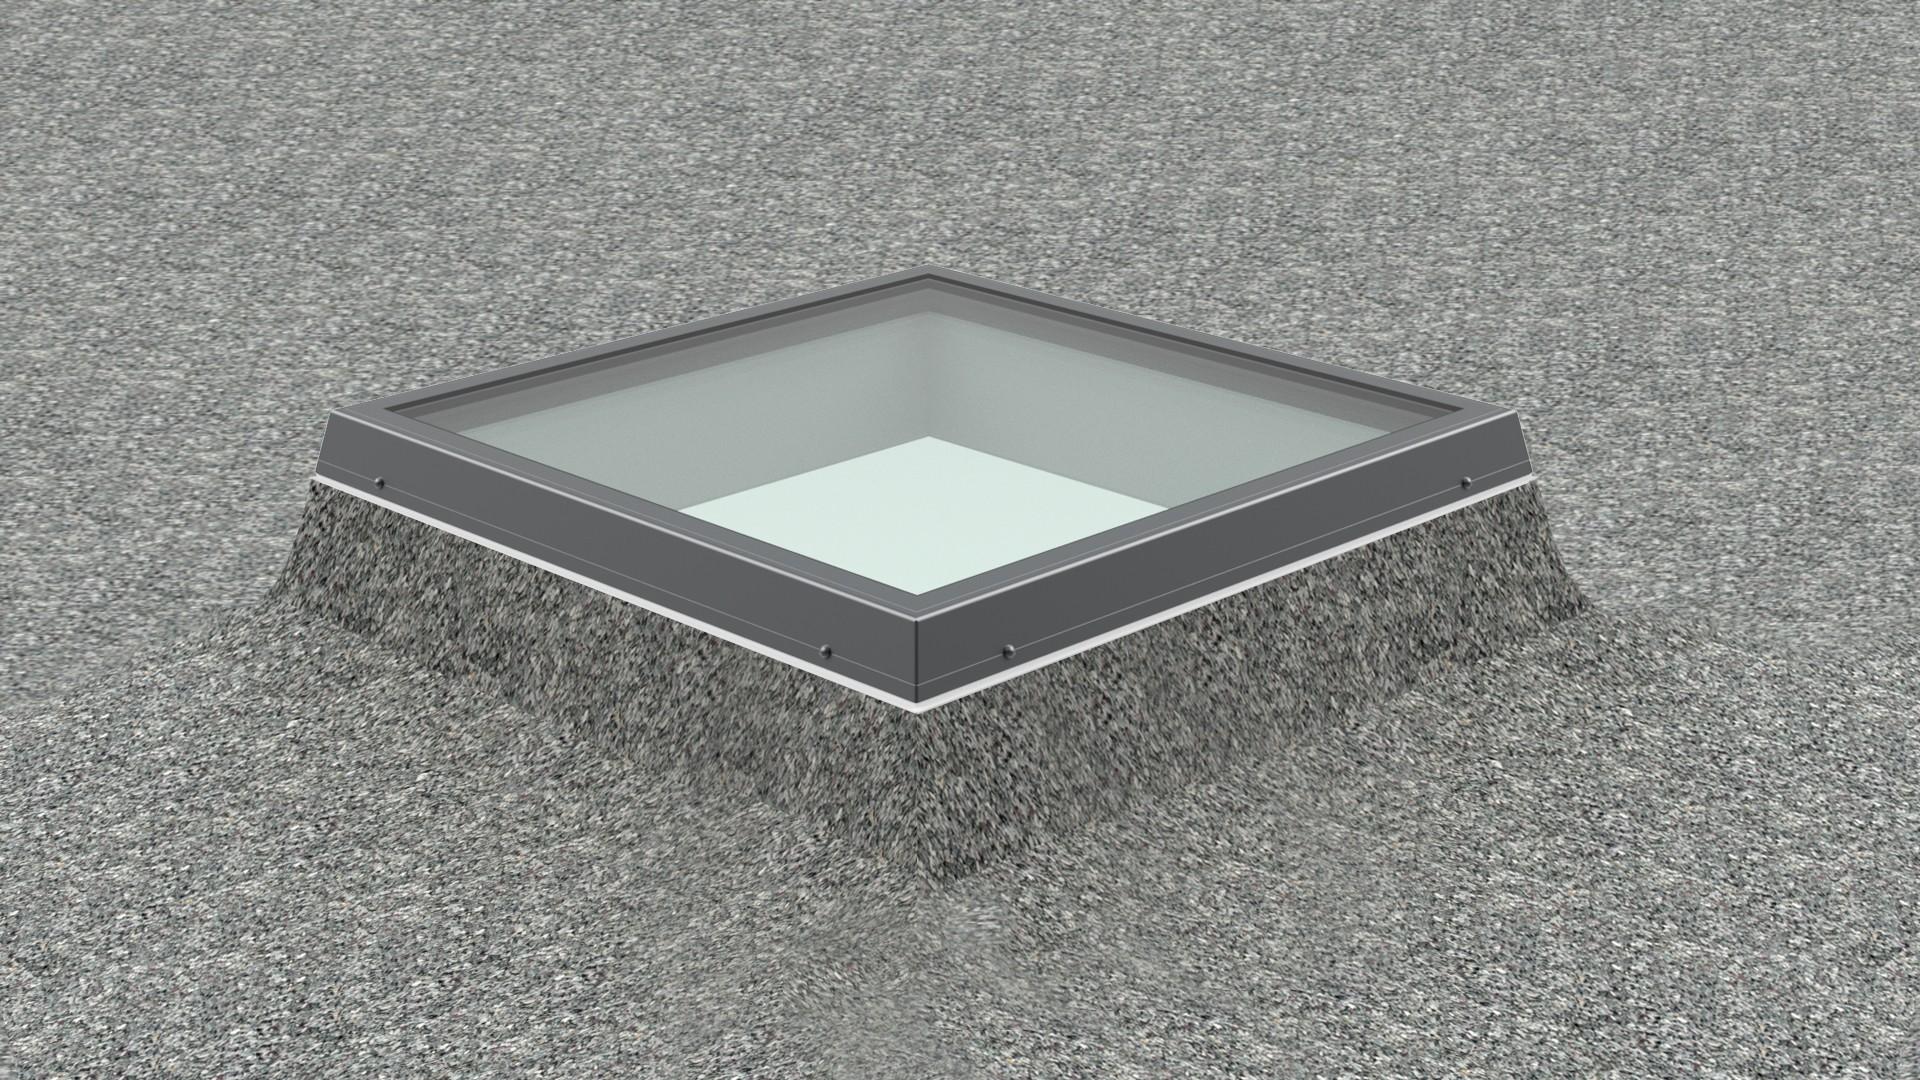 KEYLITE - Flat Glass Rooflight